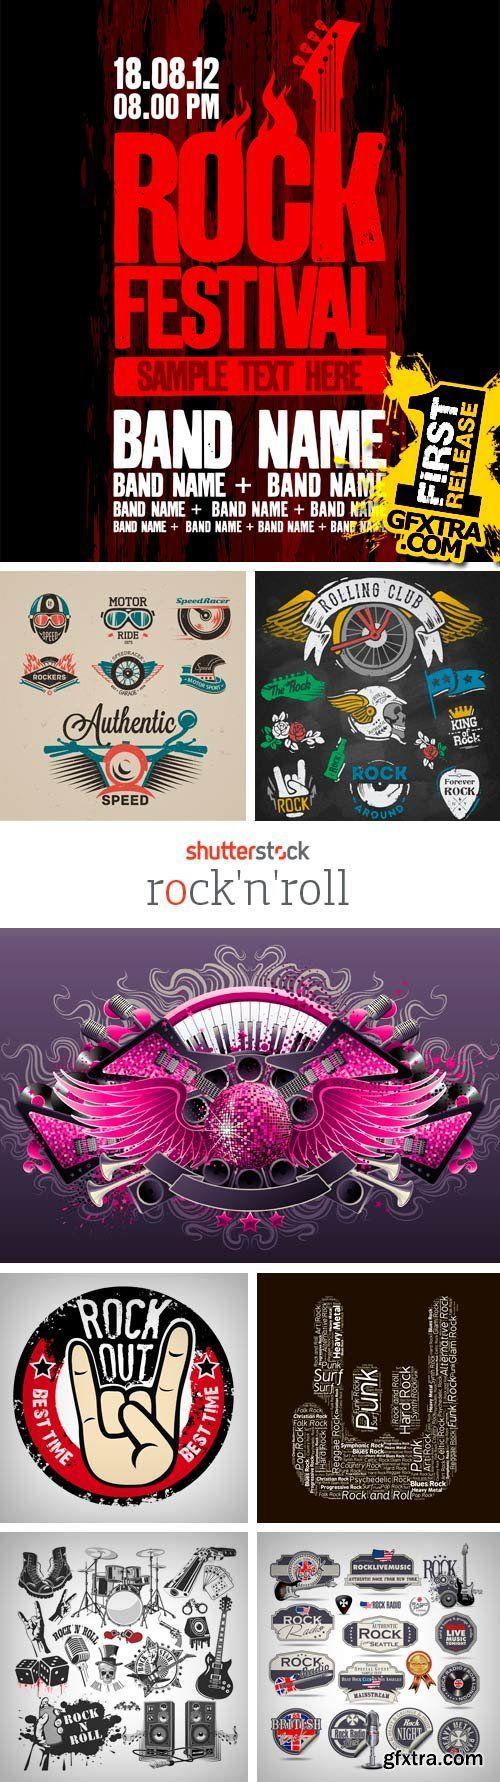 T shirt design 7 25xeps - Download